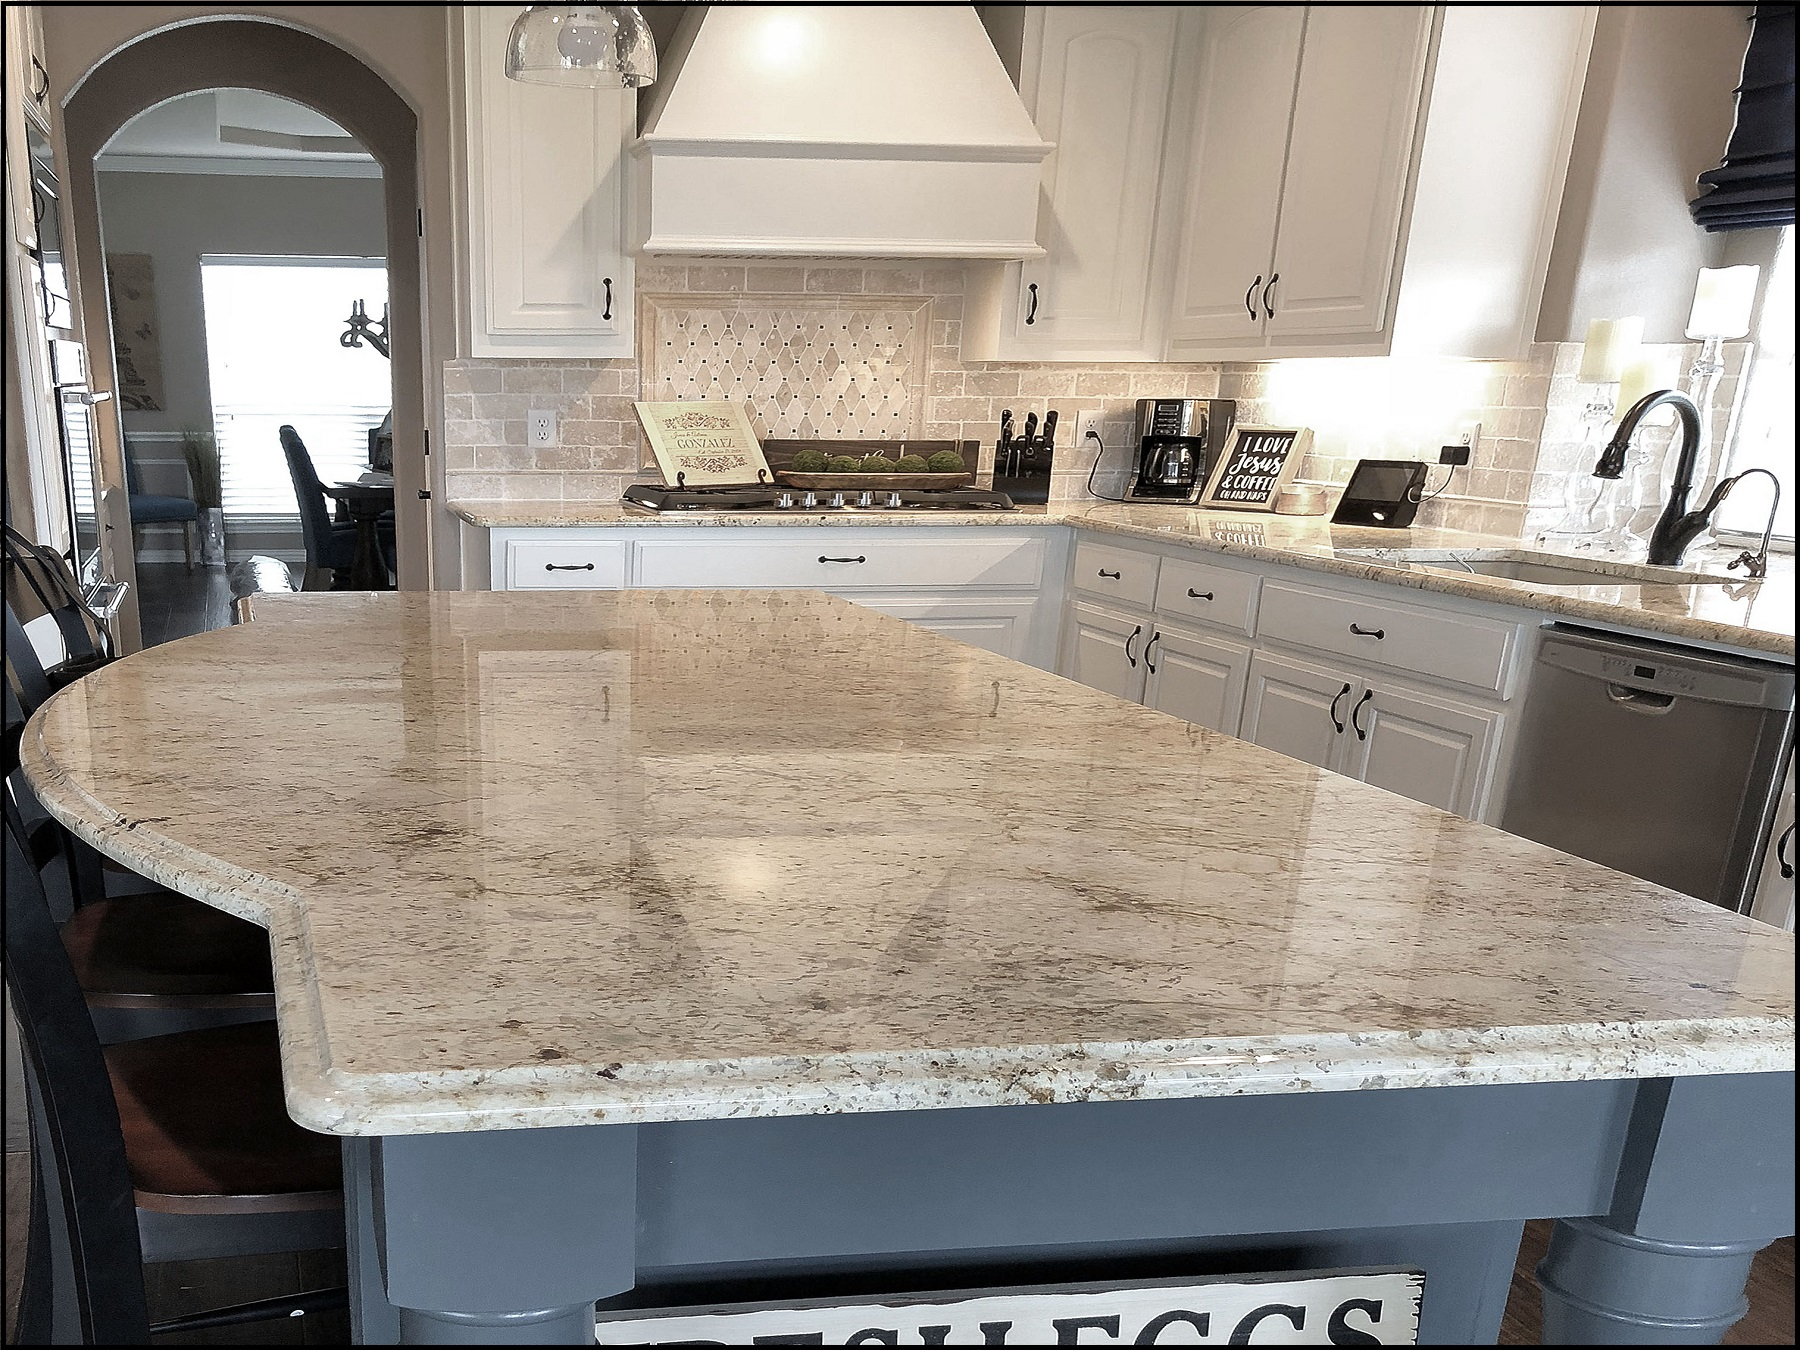 Granite Countertops Granite Quartz Quartzite Countertops Dallas Fort Worth Texas Tx By Dfw Granite Kitchens Baths Fabrication Installation